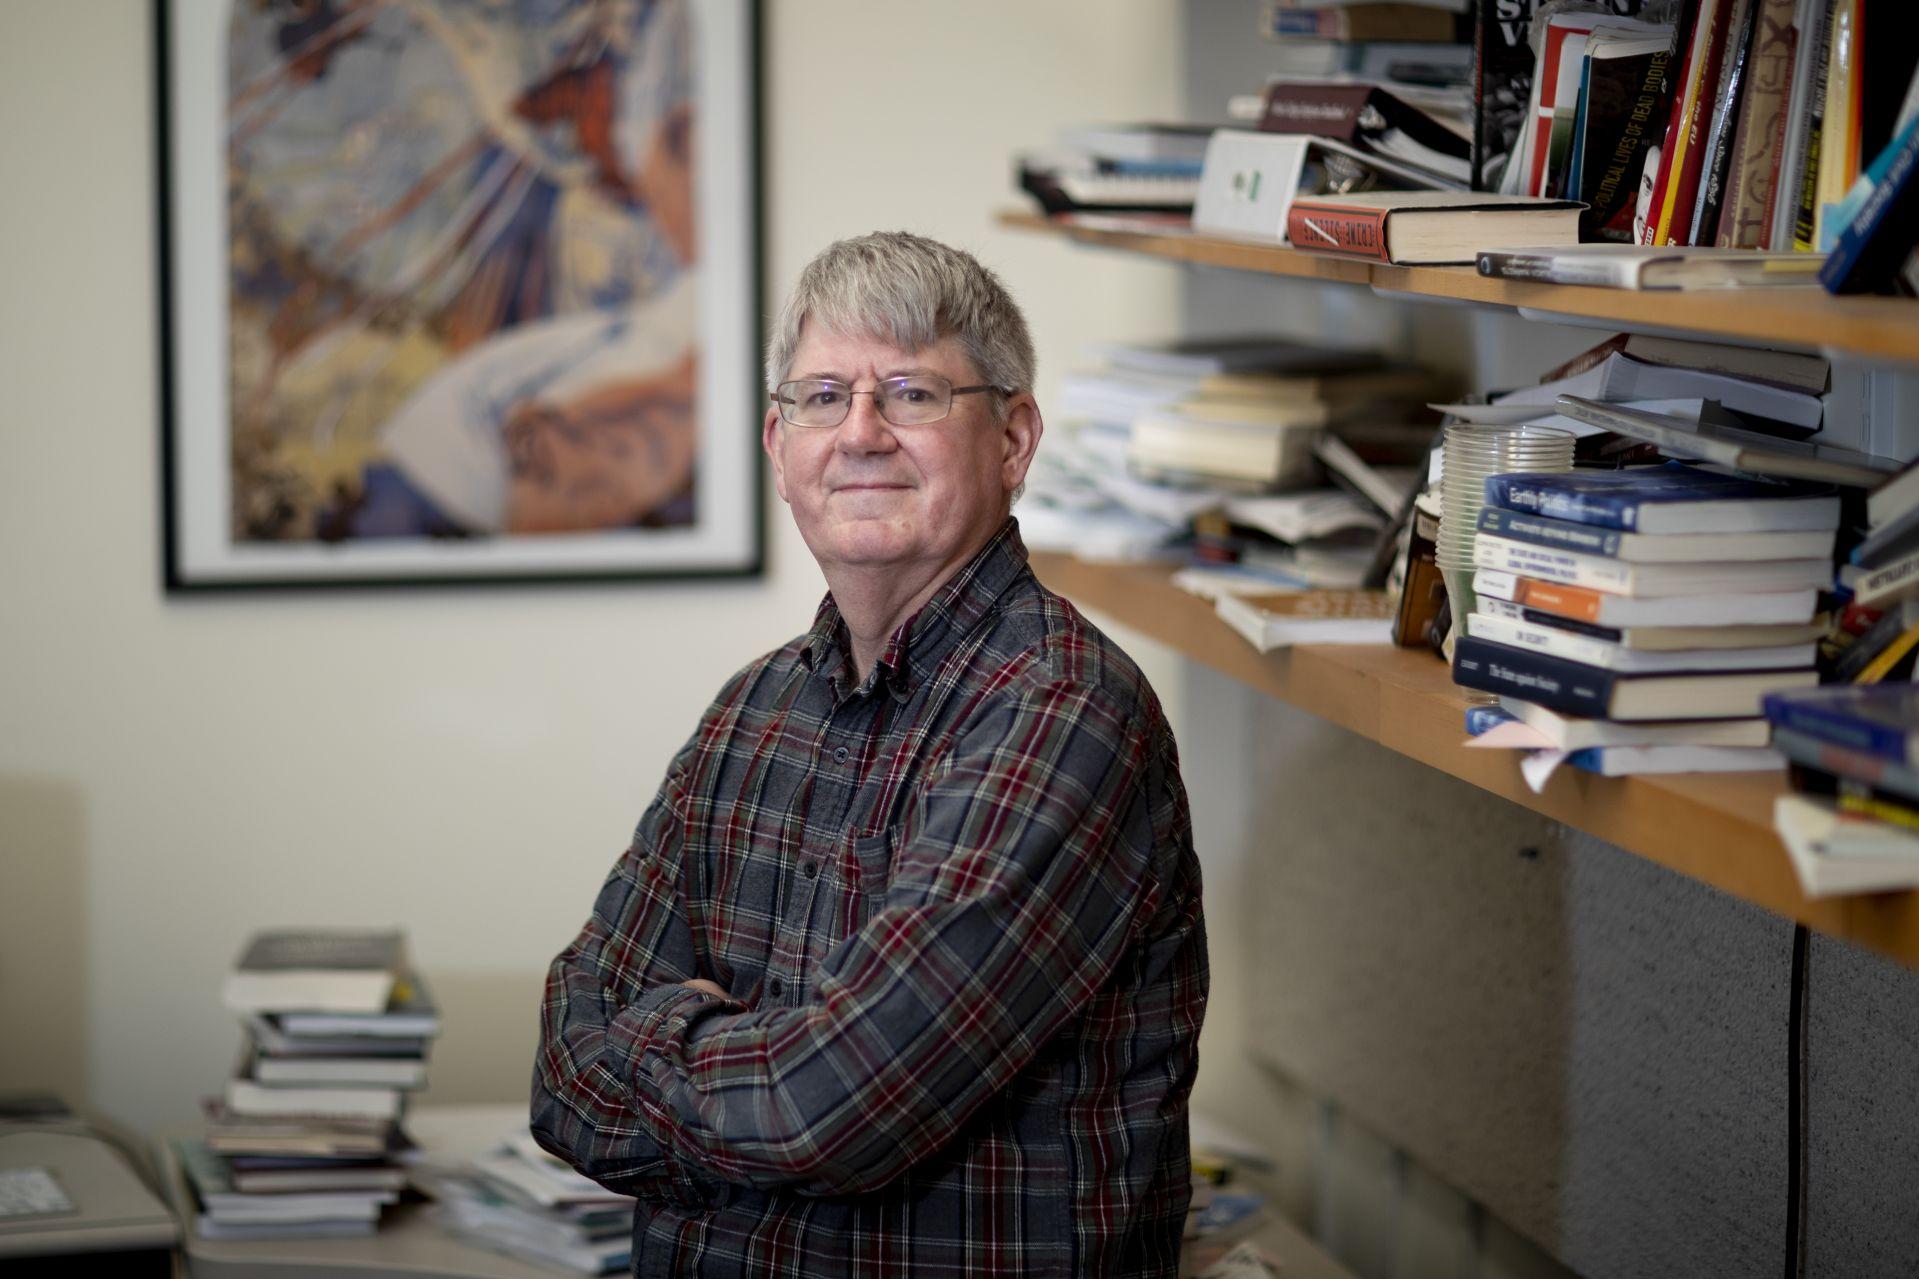 Professor of Politics James Richter in his office (Phyllis Graber Jensen/Bates College)